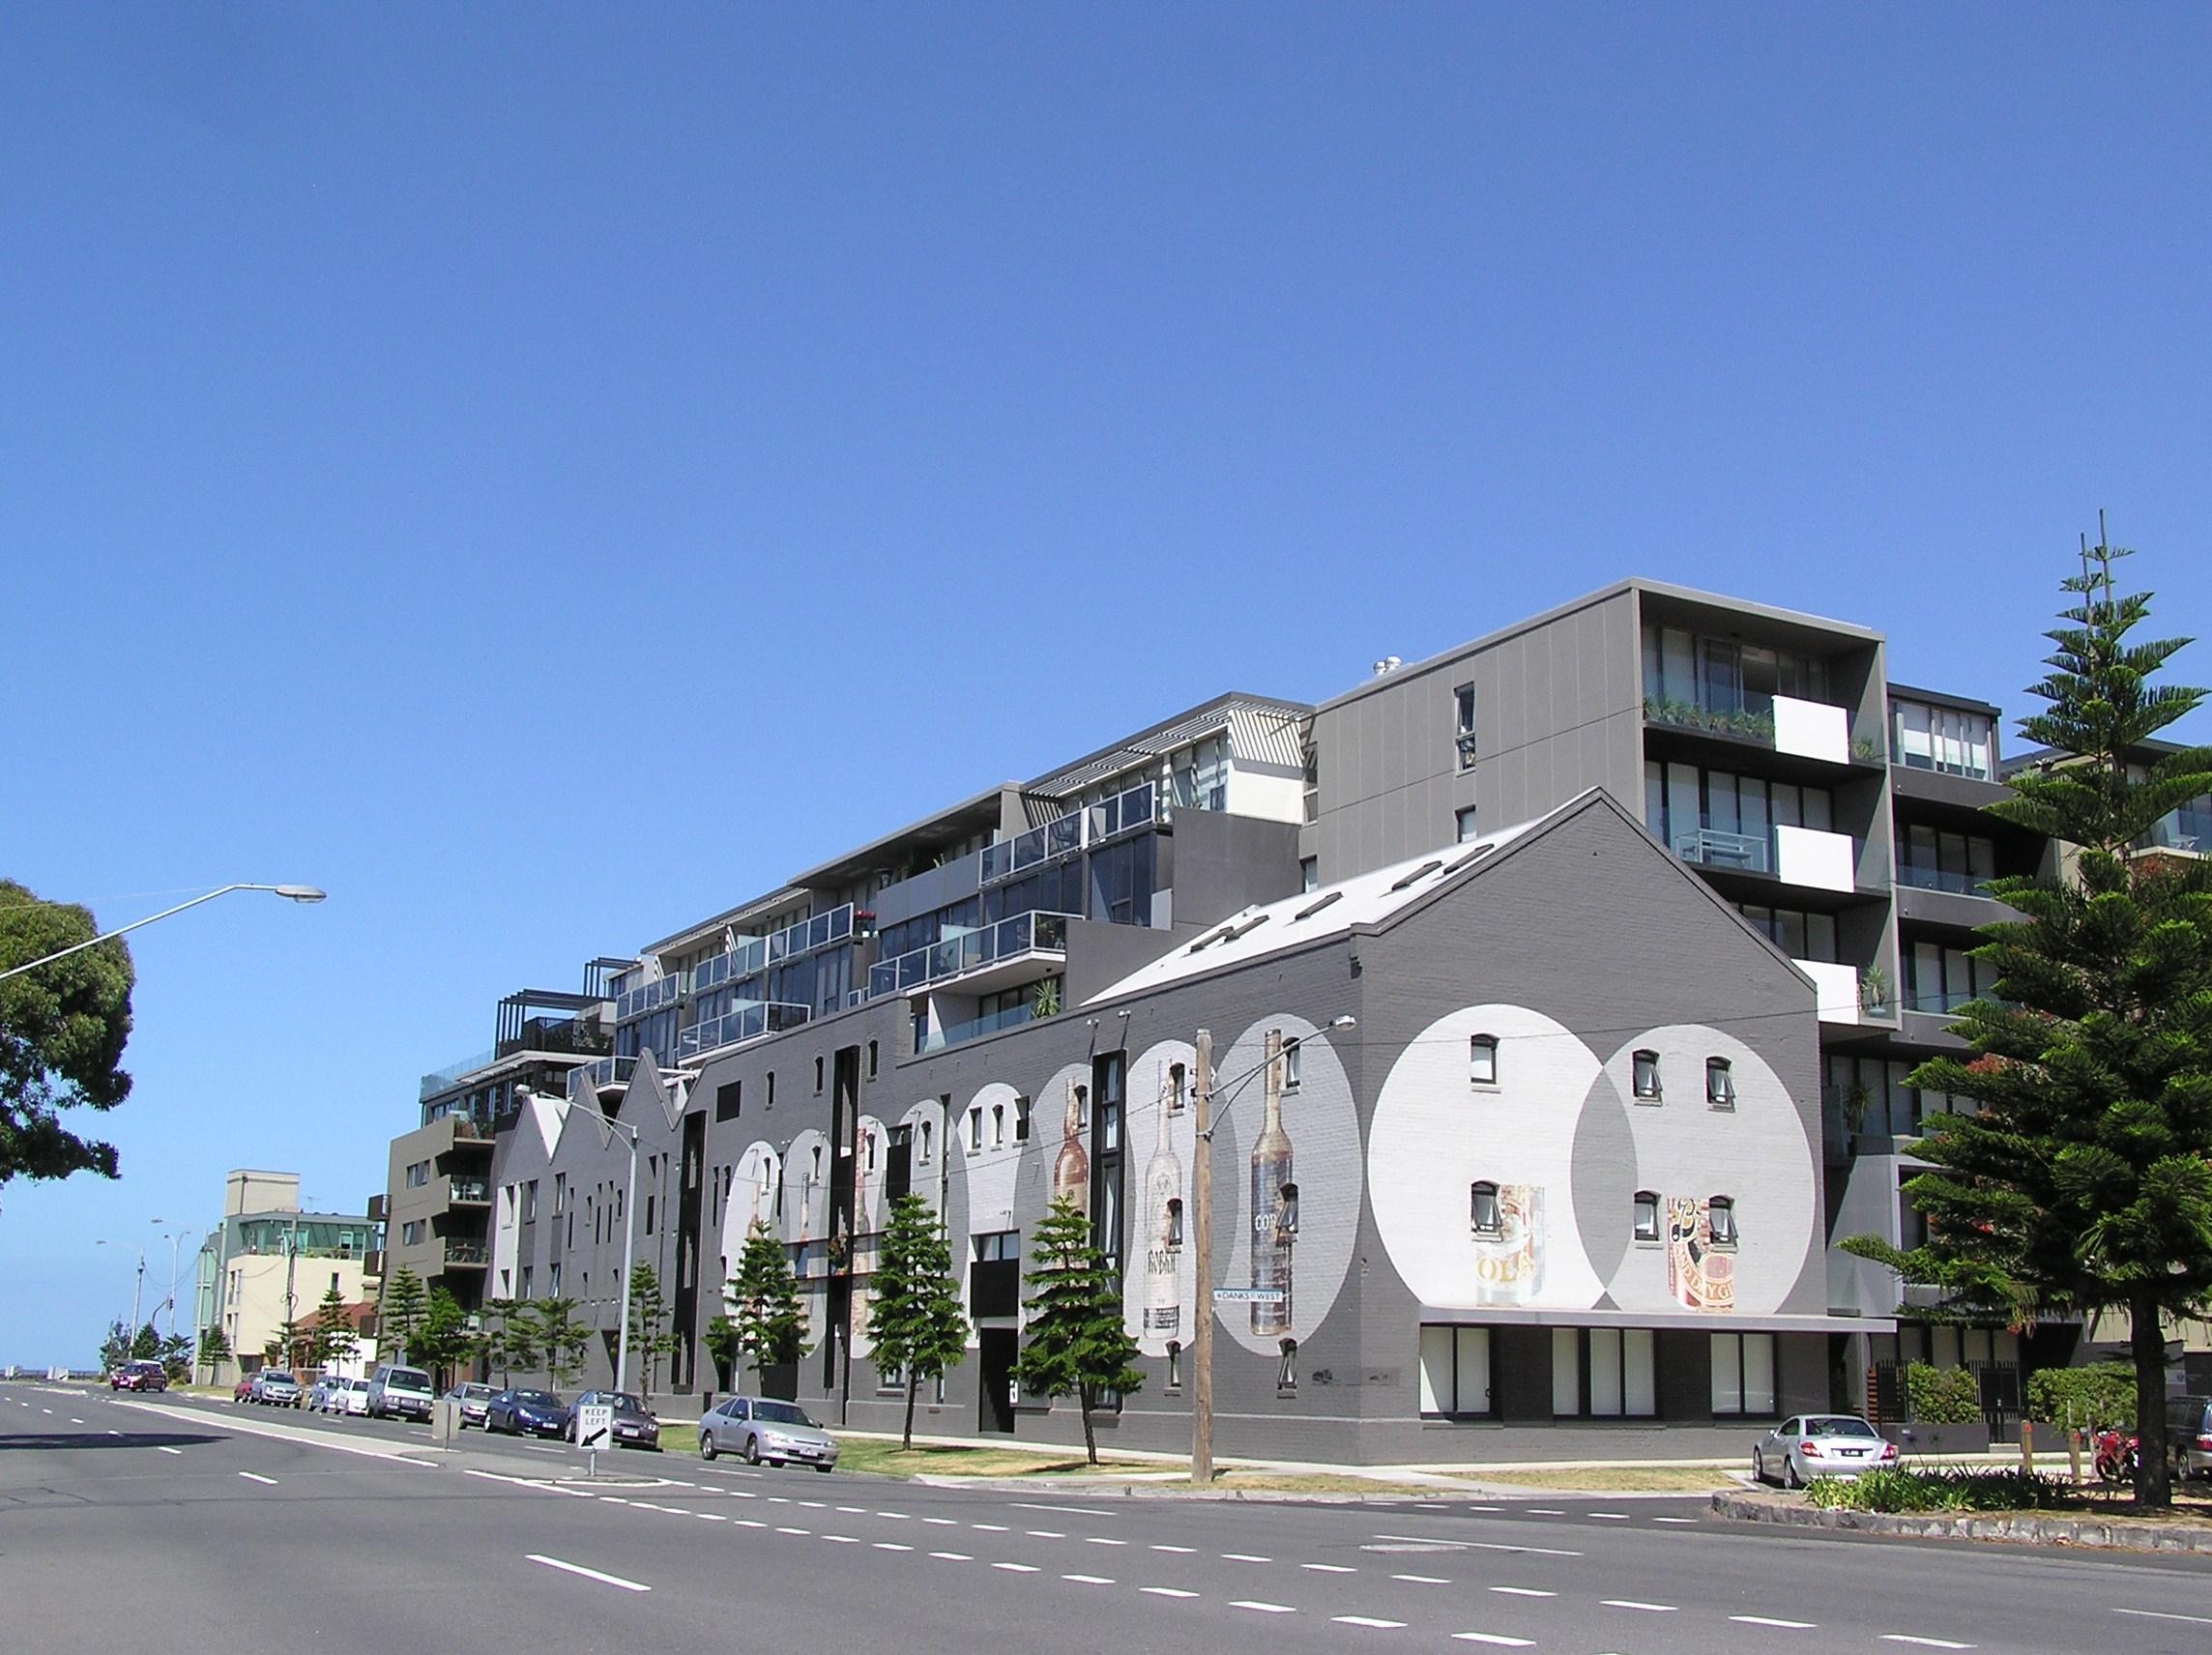 FileHeritage Warehouse Apartment in Port Melbournejpg